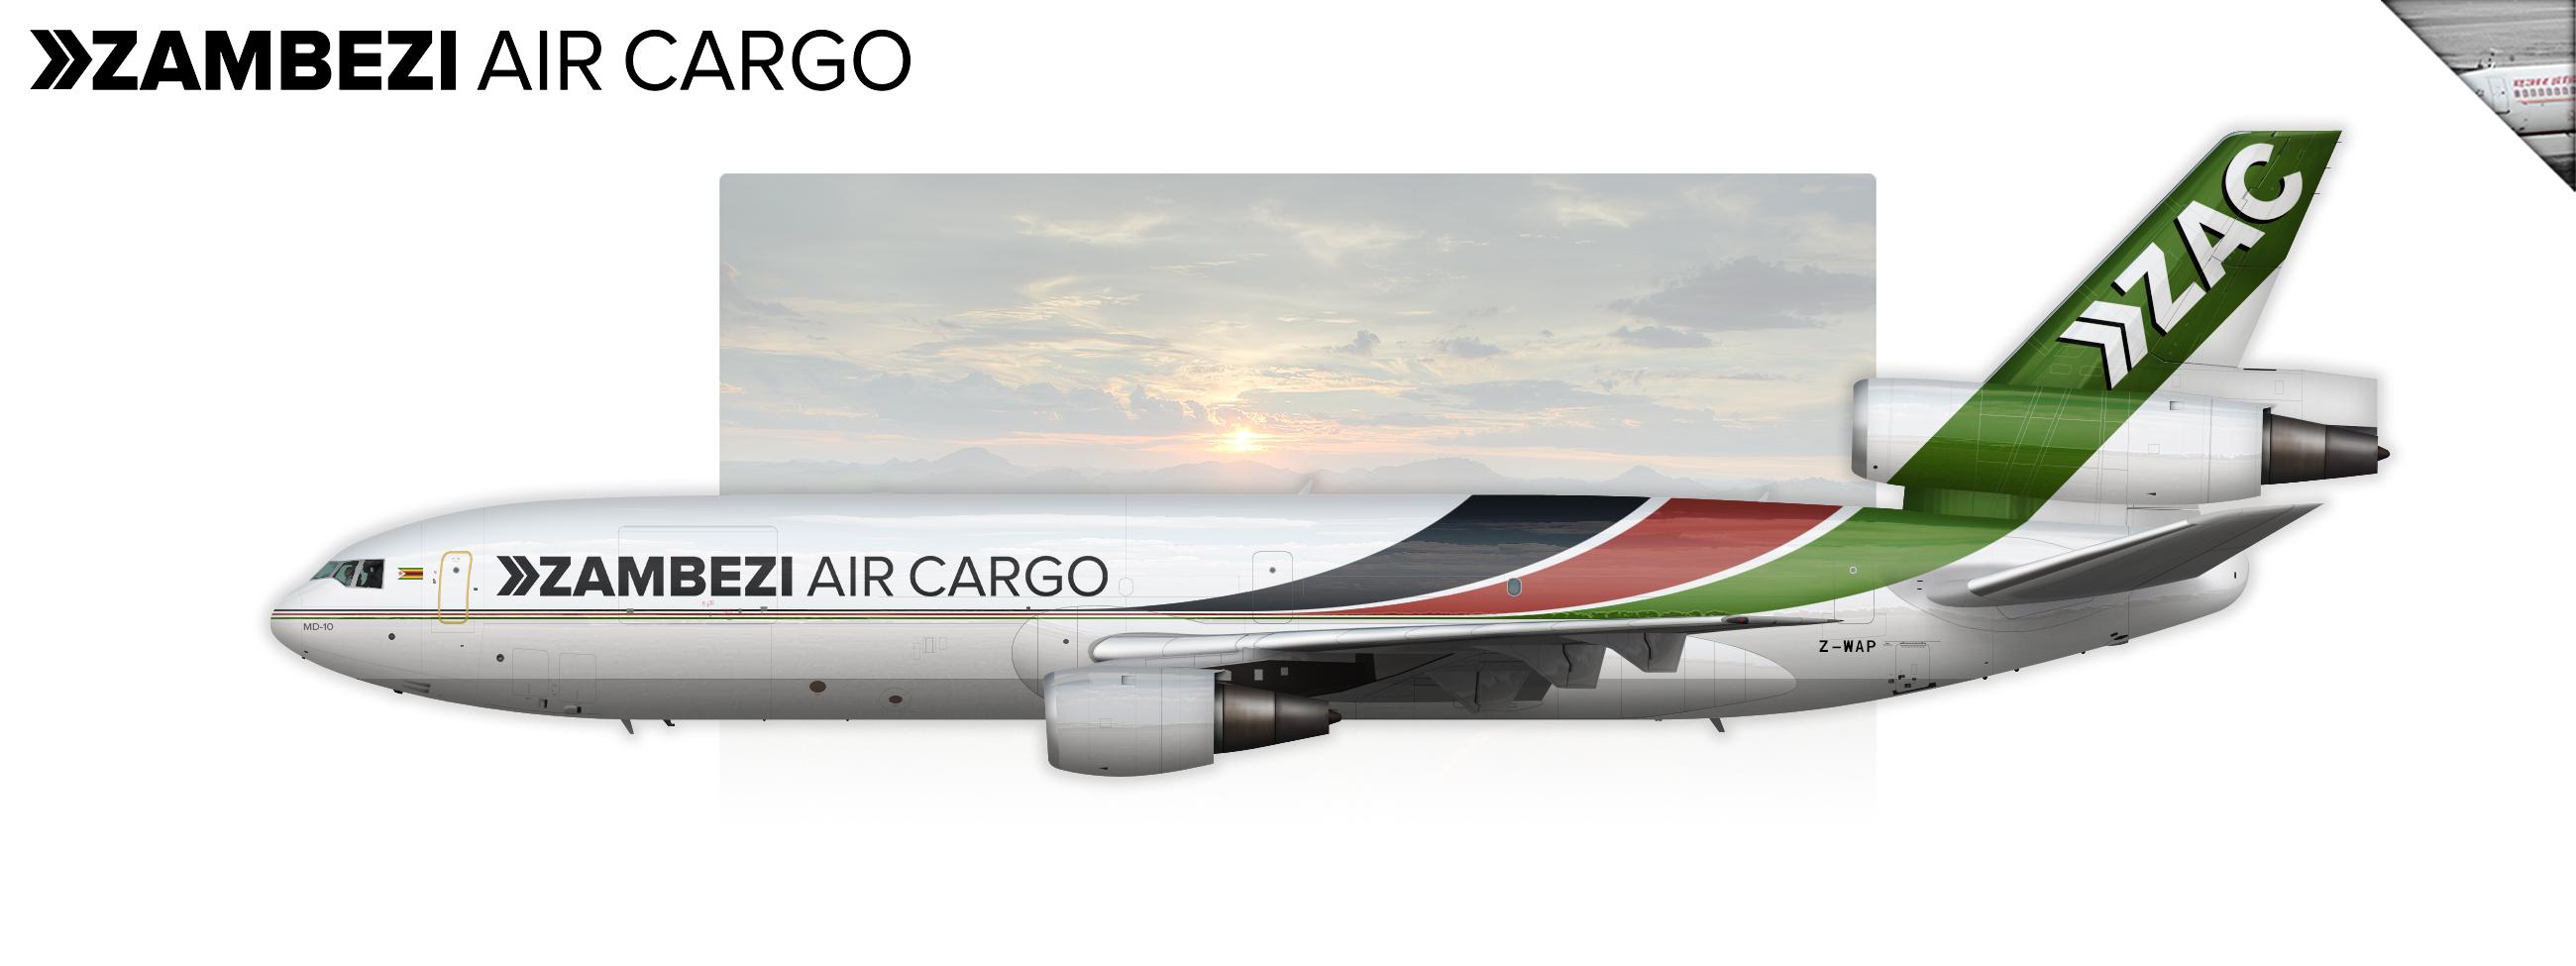 Zambezi_Air_Cargo_McDonnell_Douglas_MD-1